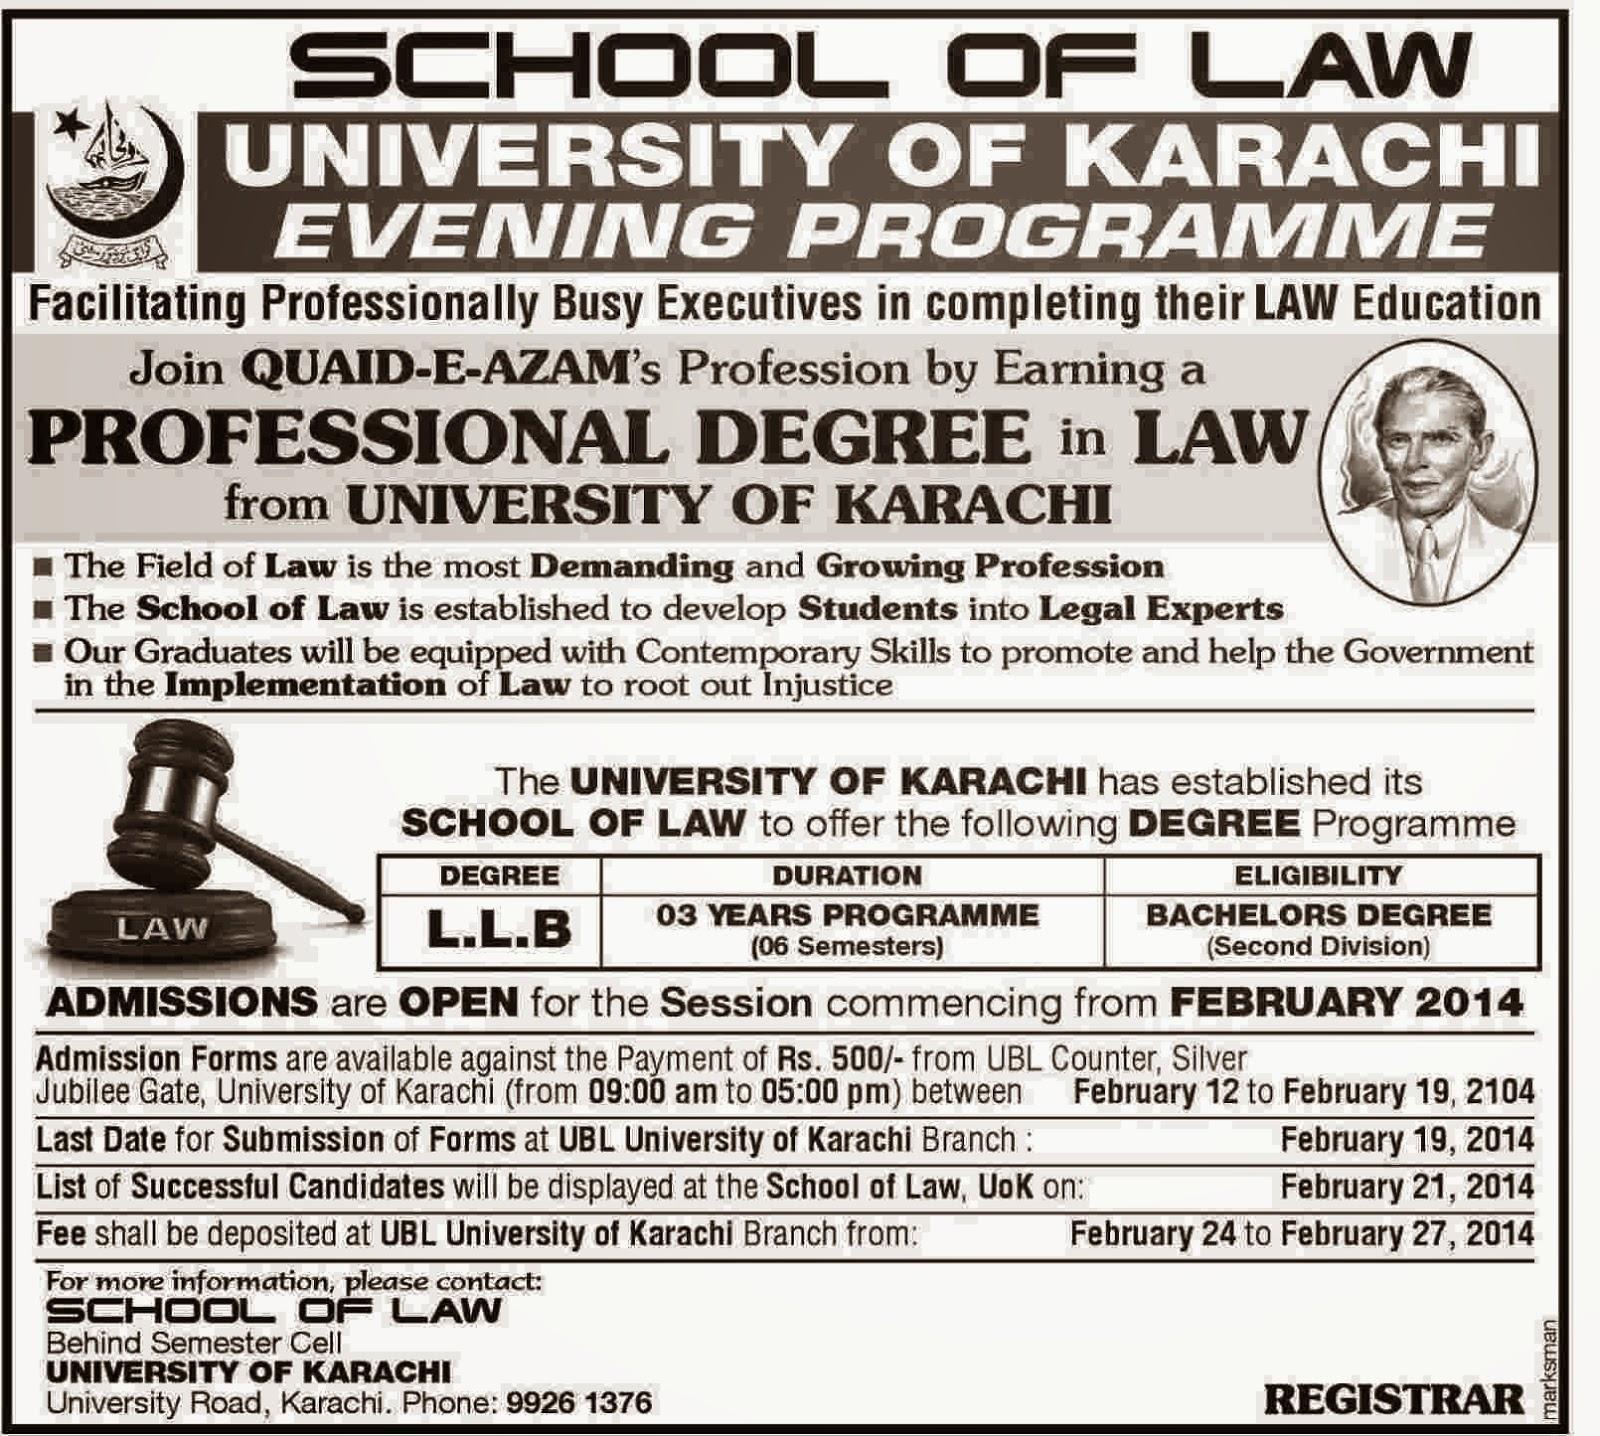 Evening Program School of Law University of Karachi 2014